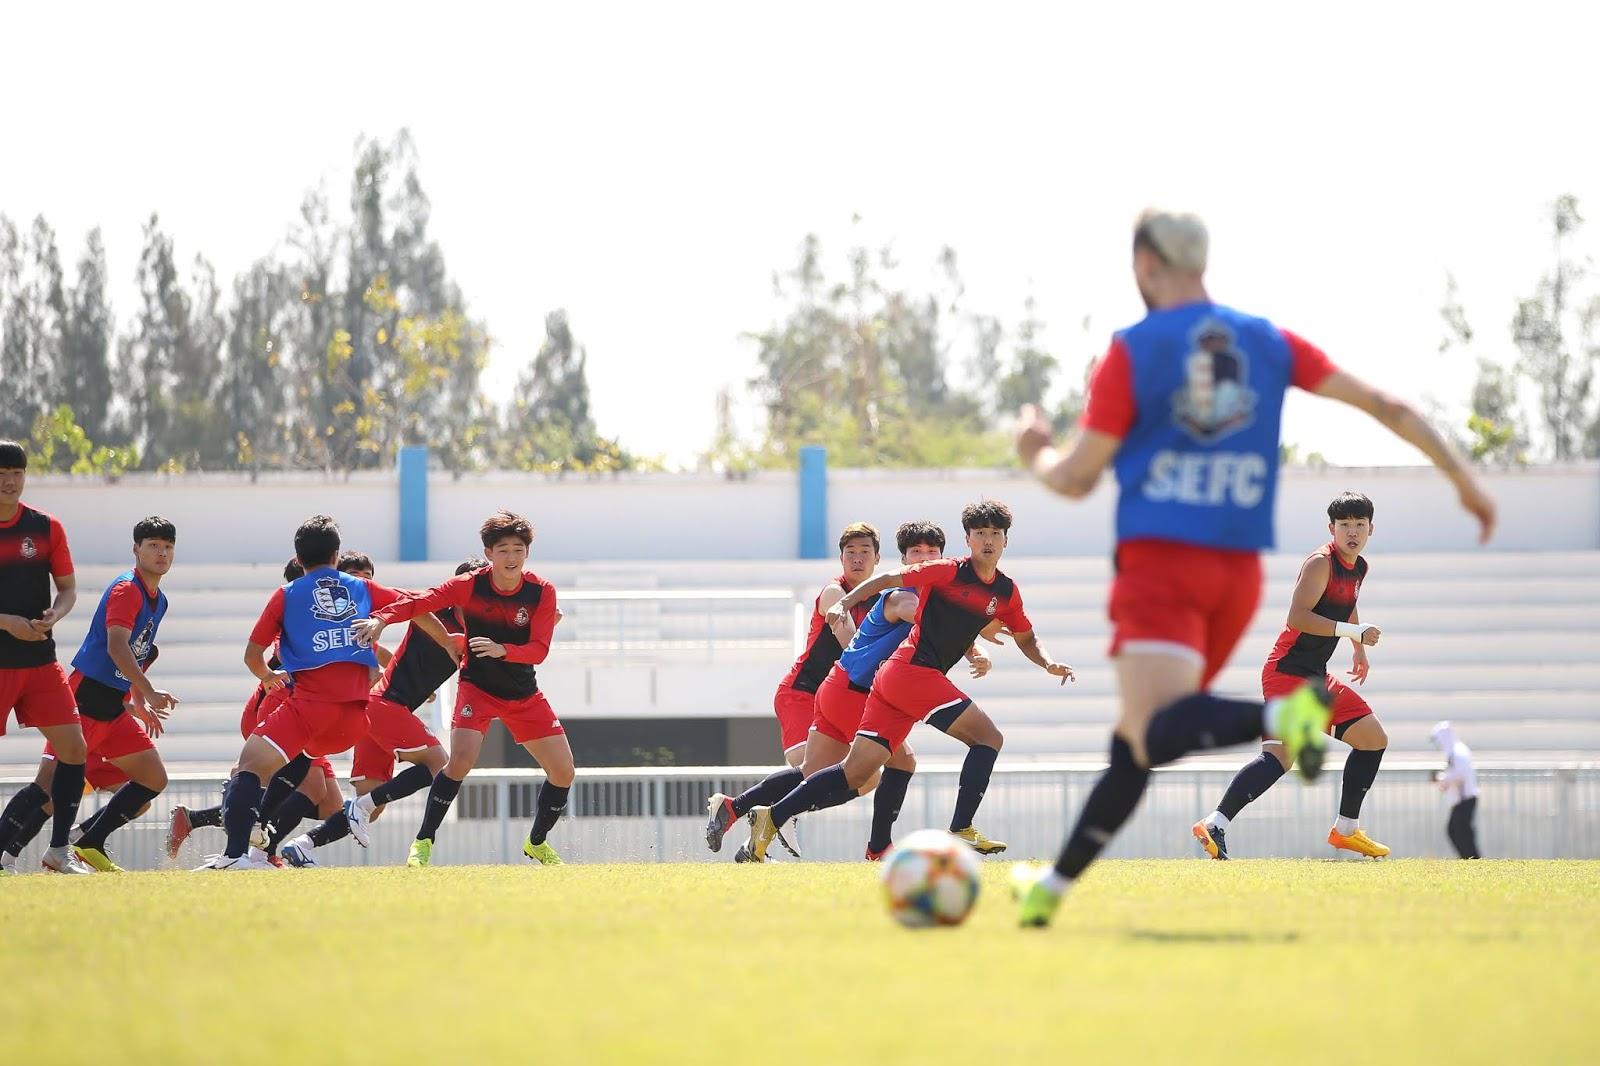 K League 2 2019 Preview: Seoul E-Land vs Gwangju FC